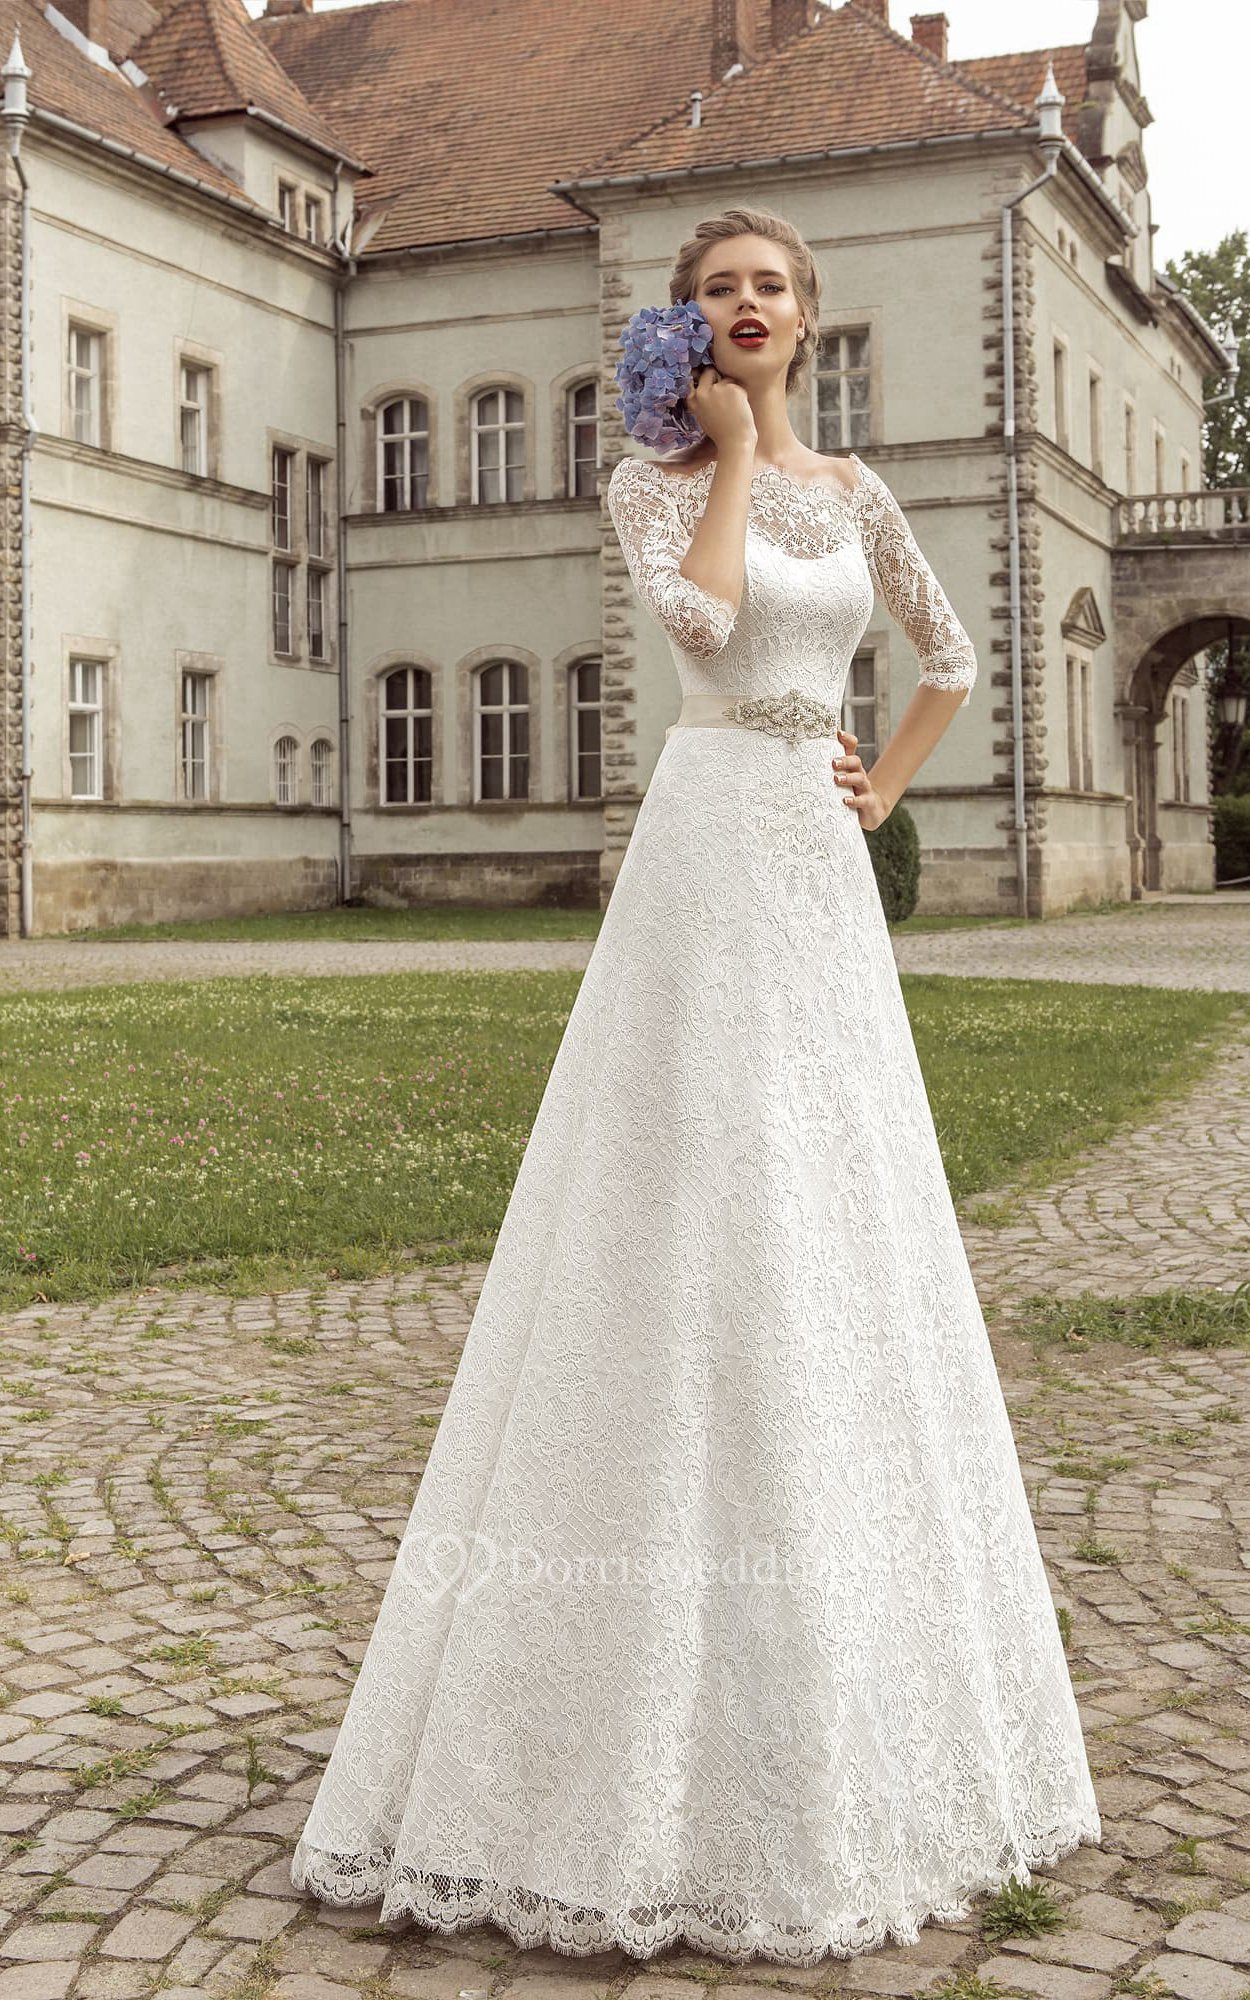 Knee High Petite Wedding Dresses